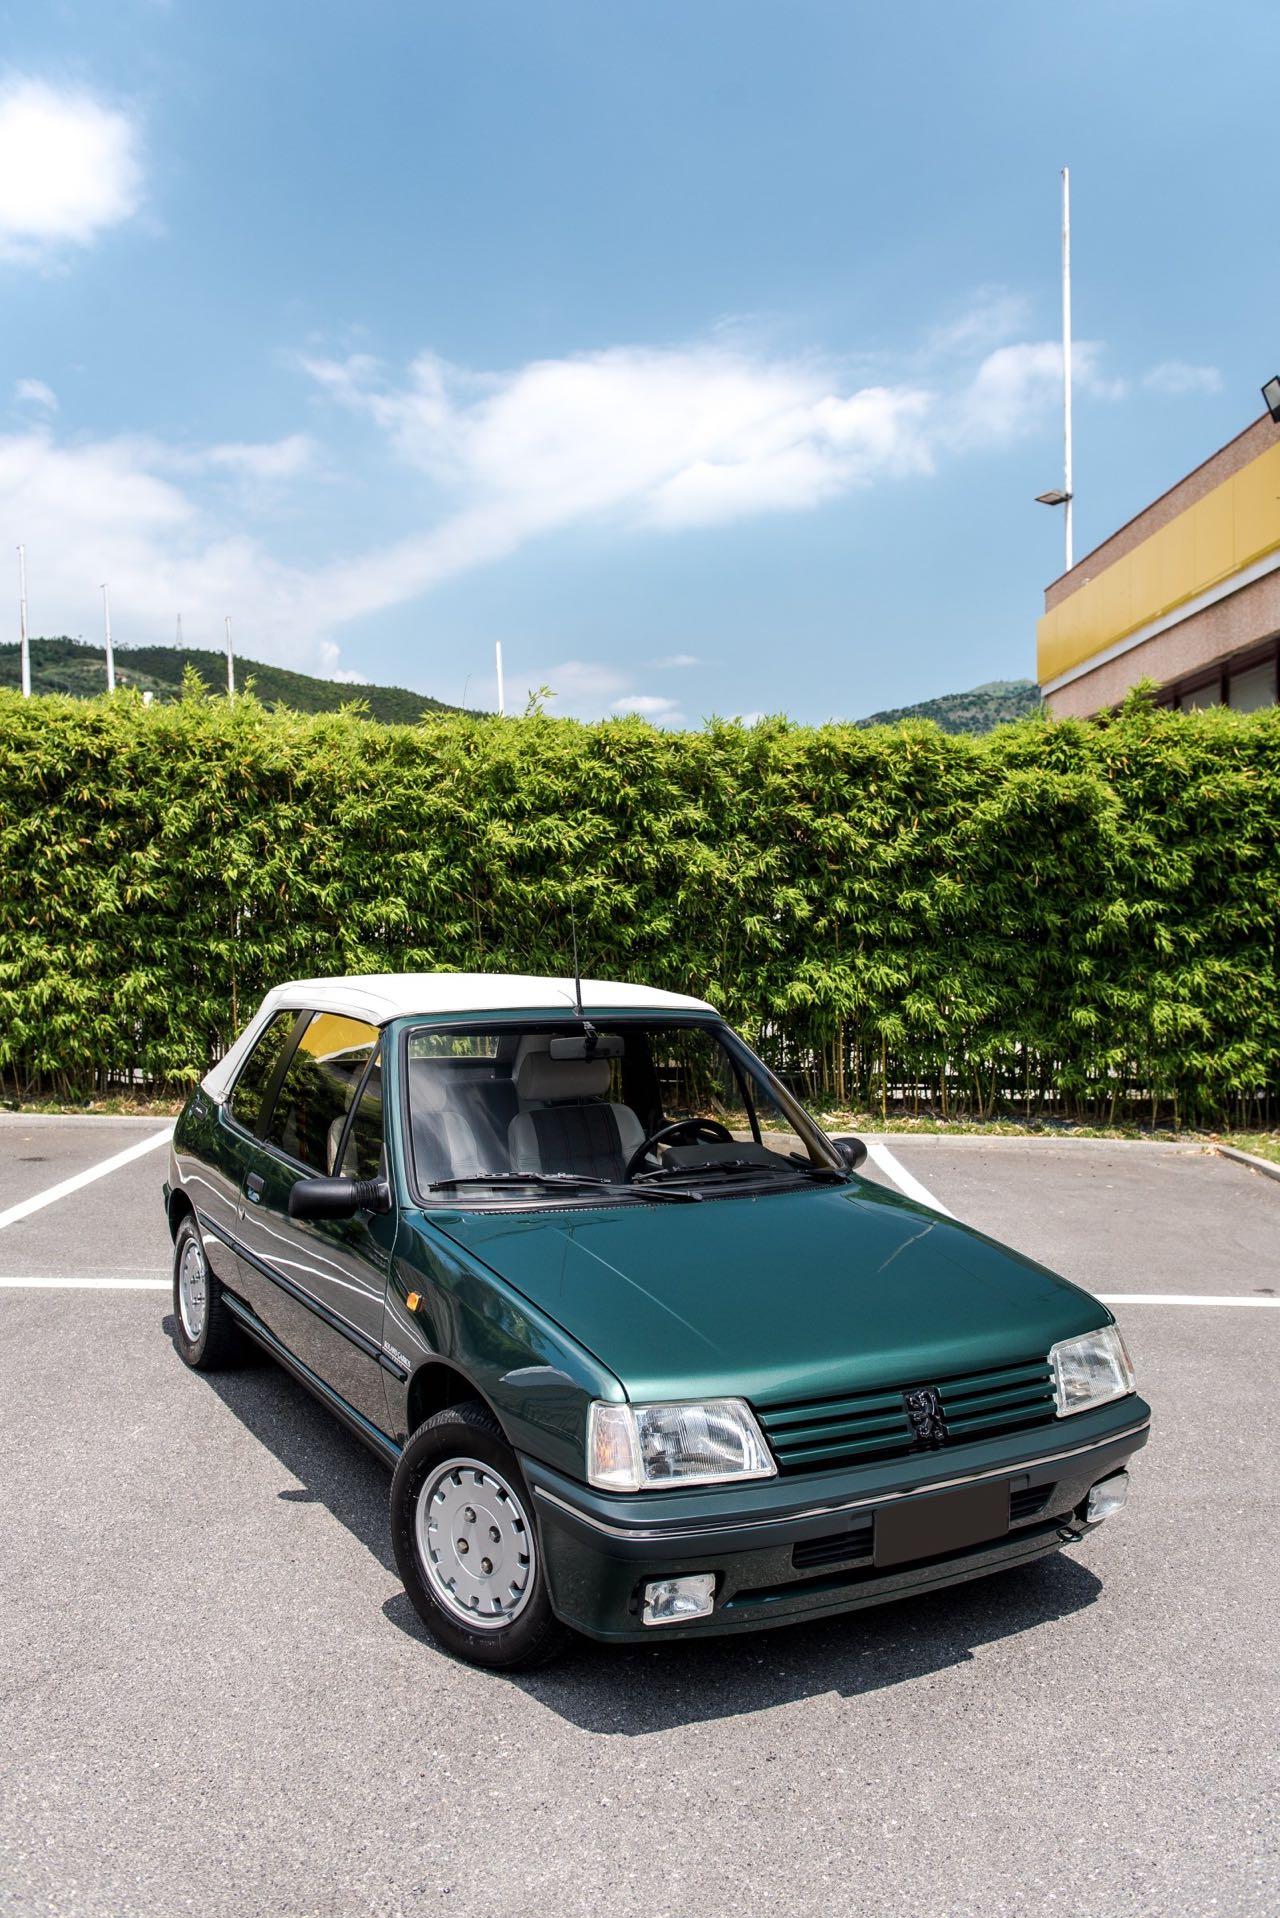 Peugeot 205 Cabriolet Roland Garros - Jeu, set et match ! 22